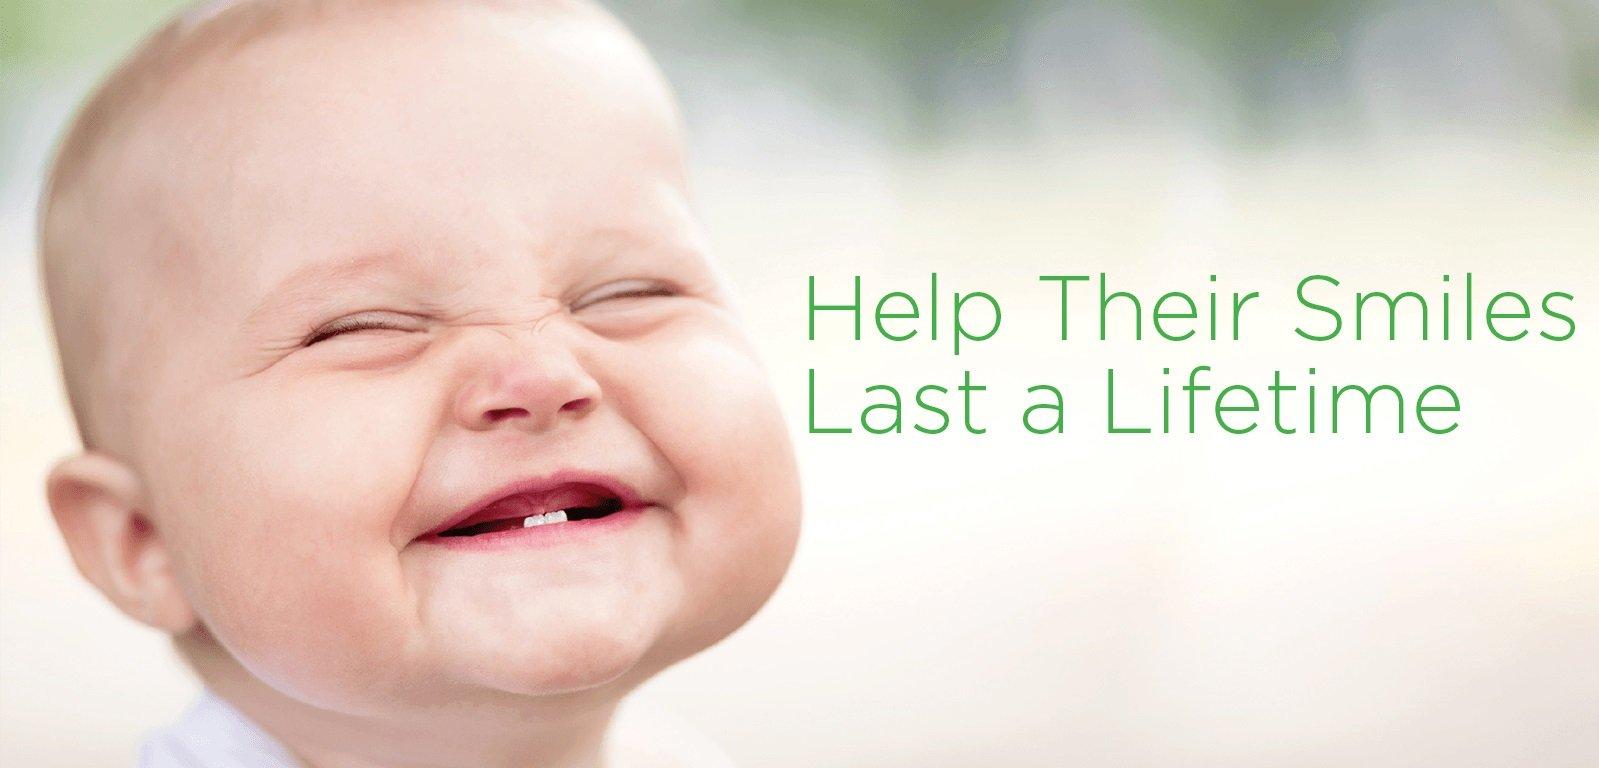 Waterloo Dentist - Erbsville Dental - A baby smiling